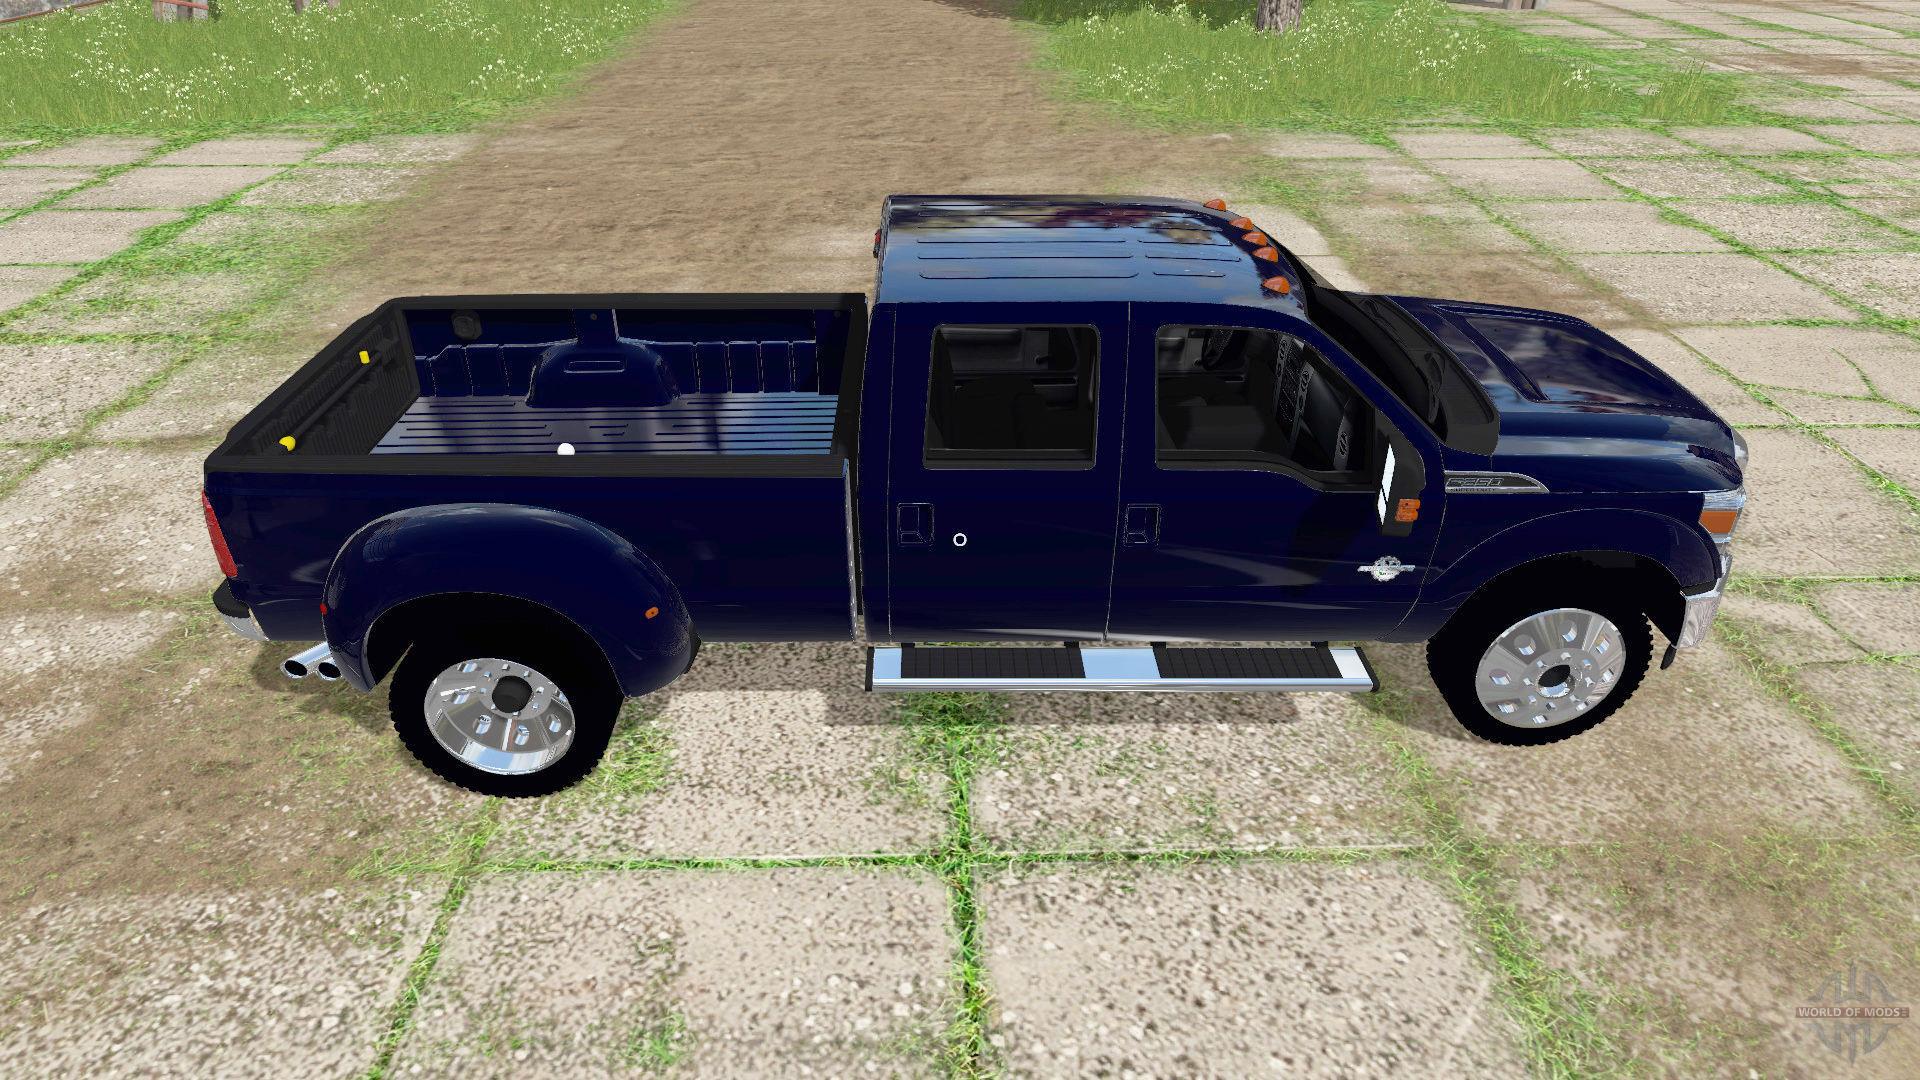 super ot ford review edmunds ratings duty f diesel